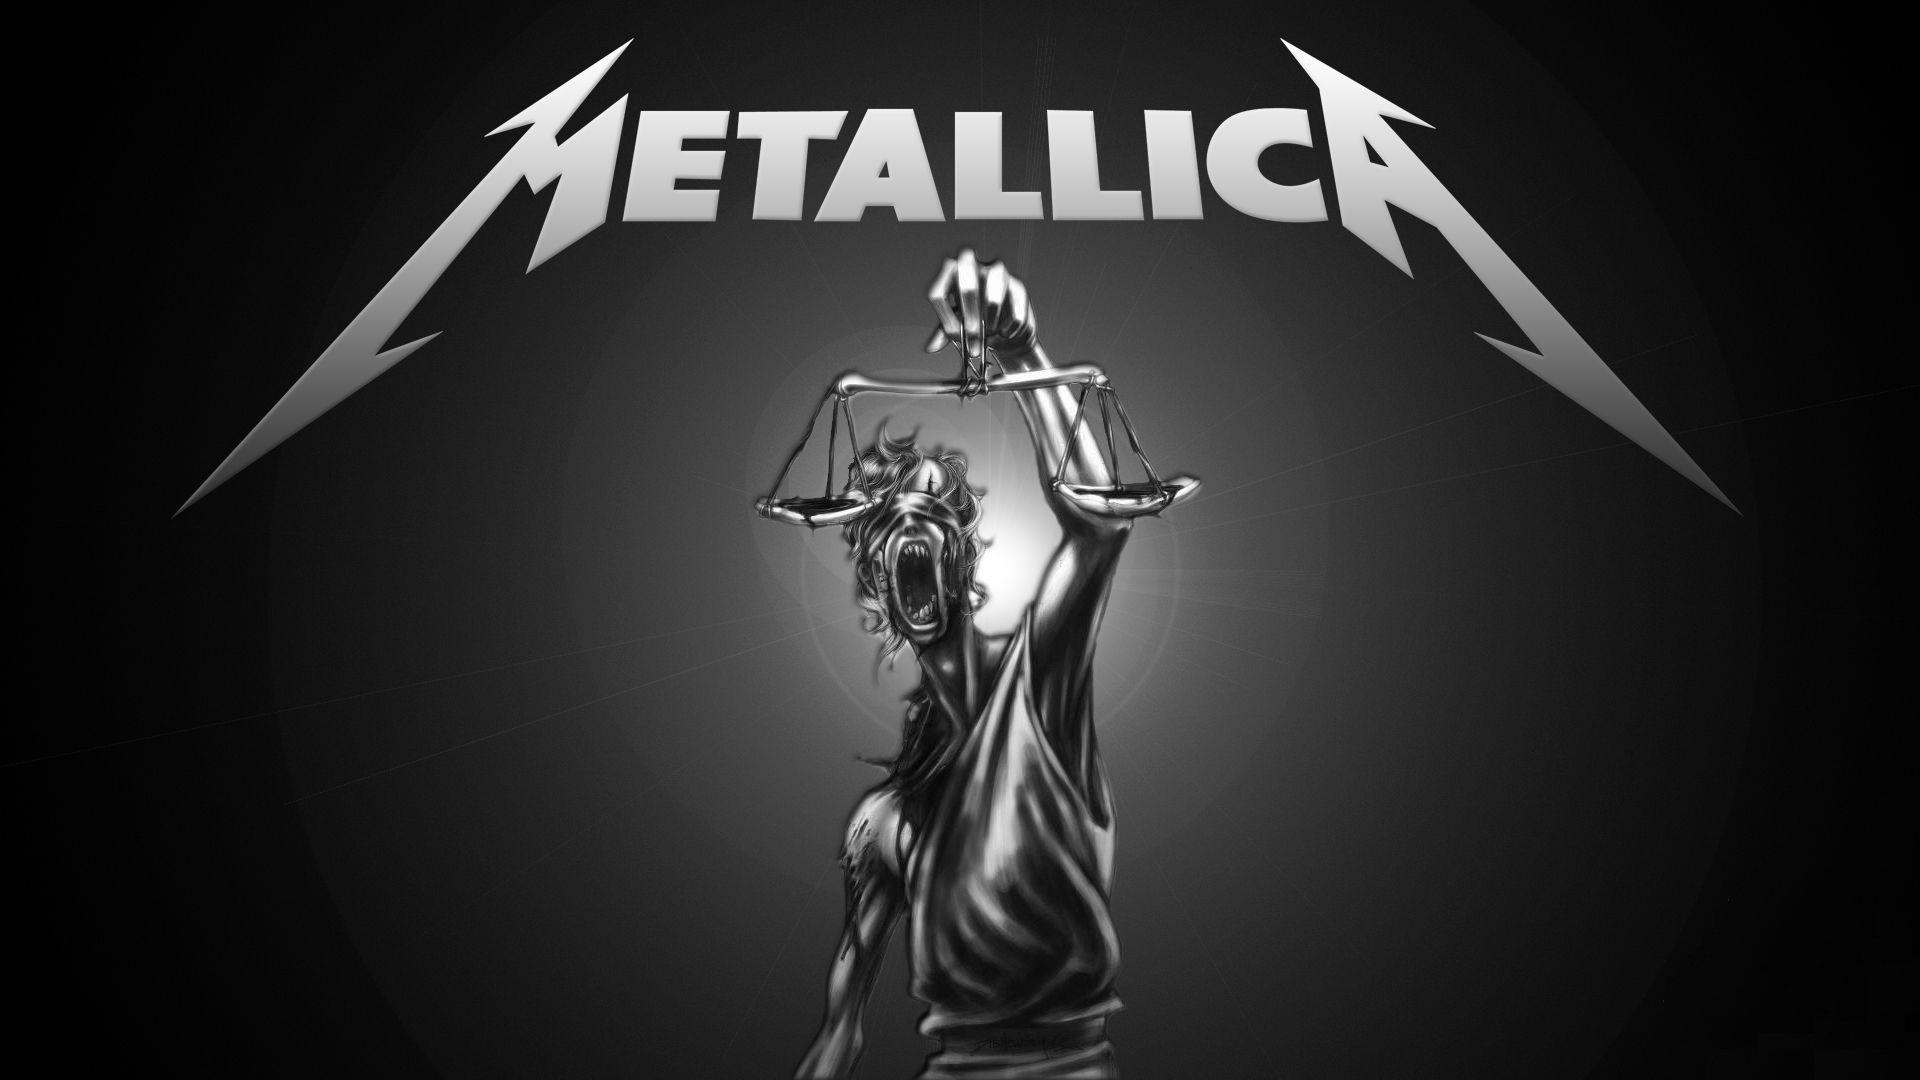 Metallica Background